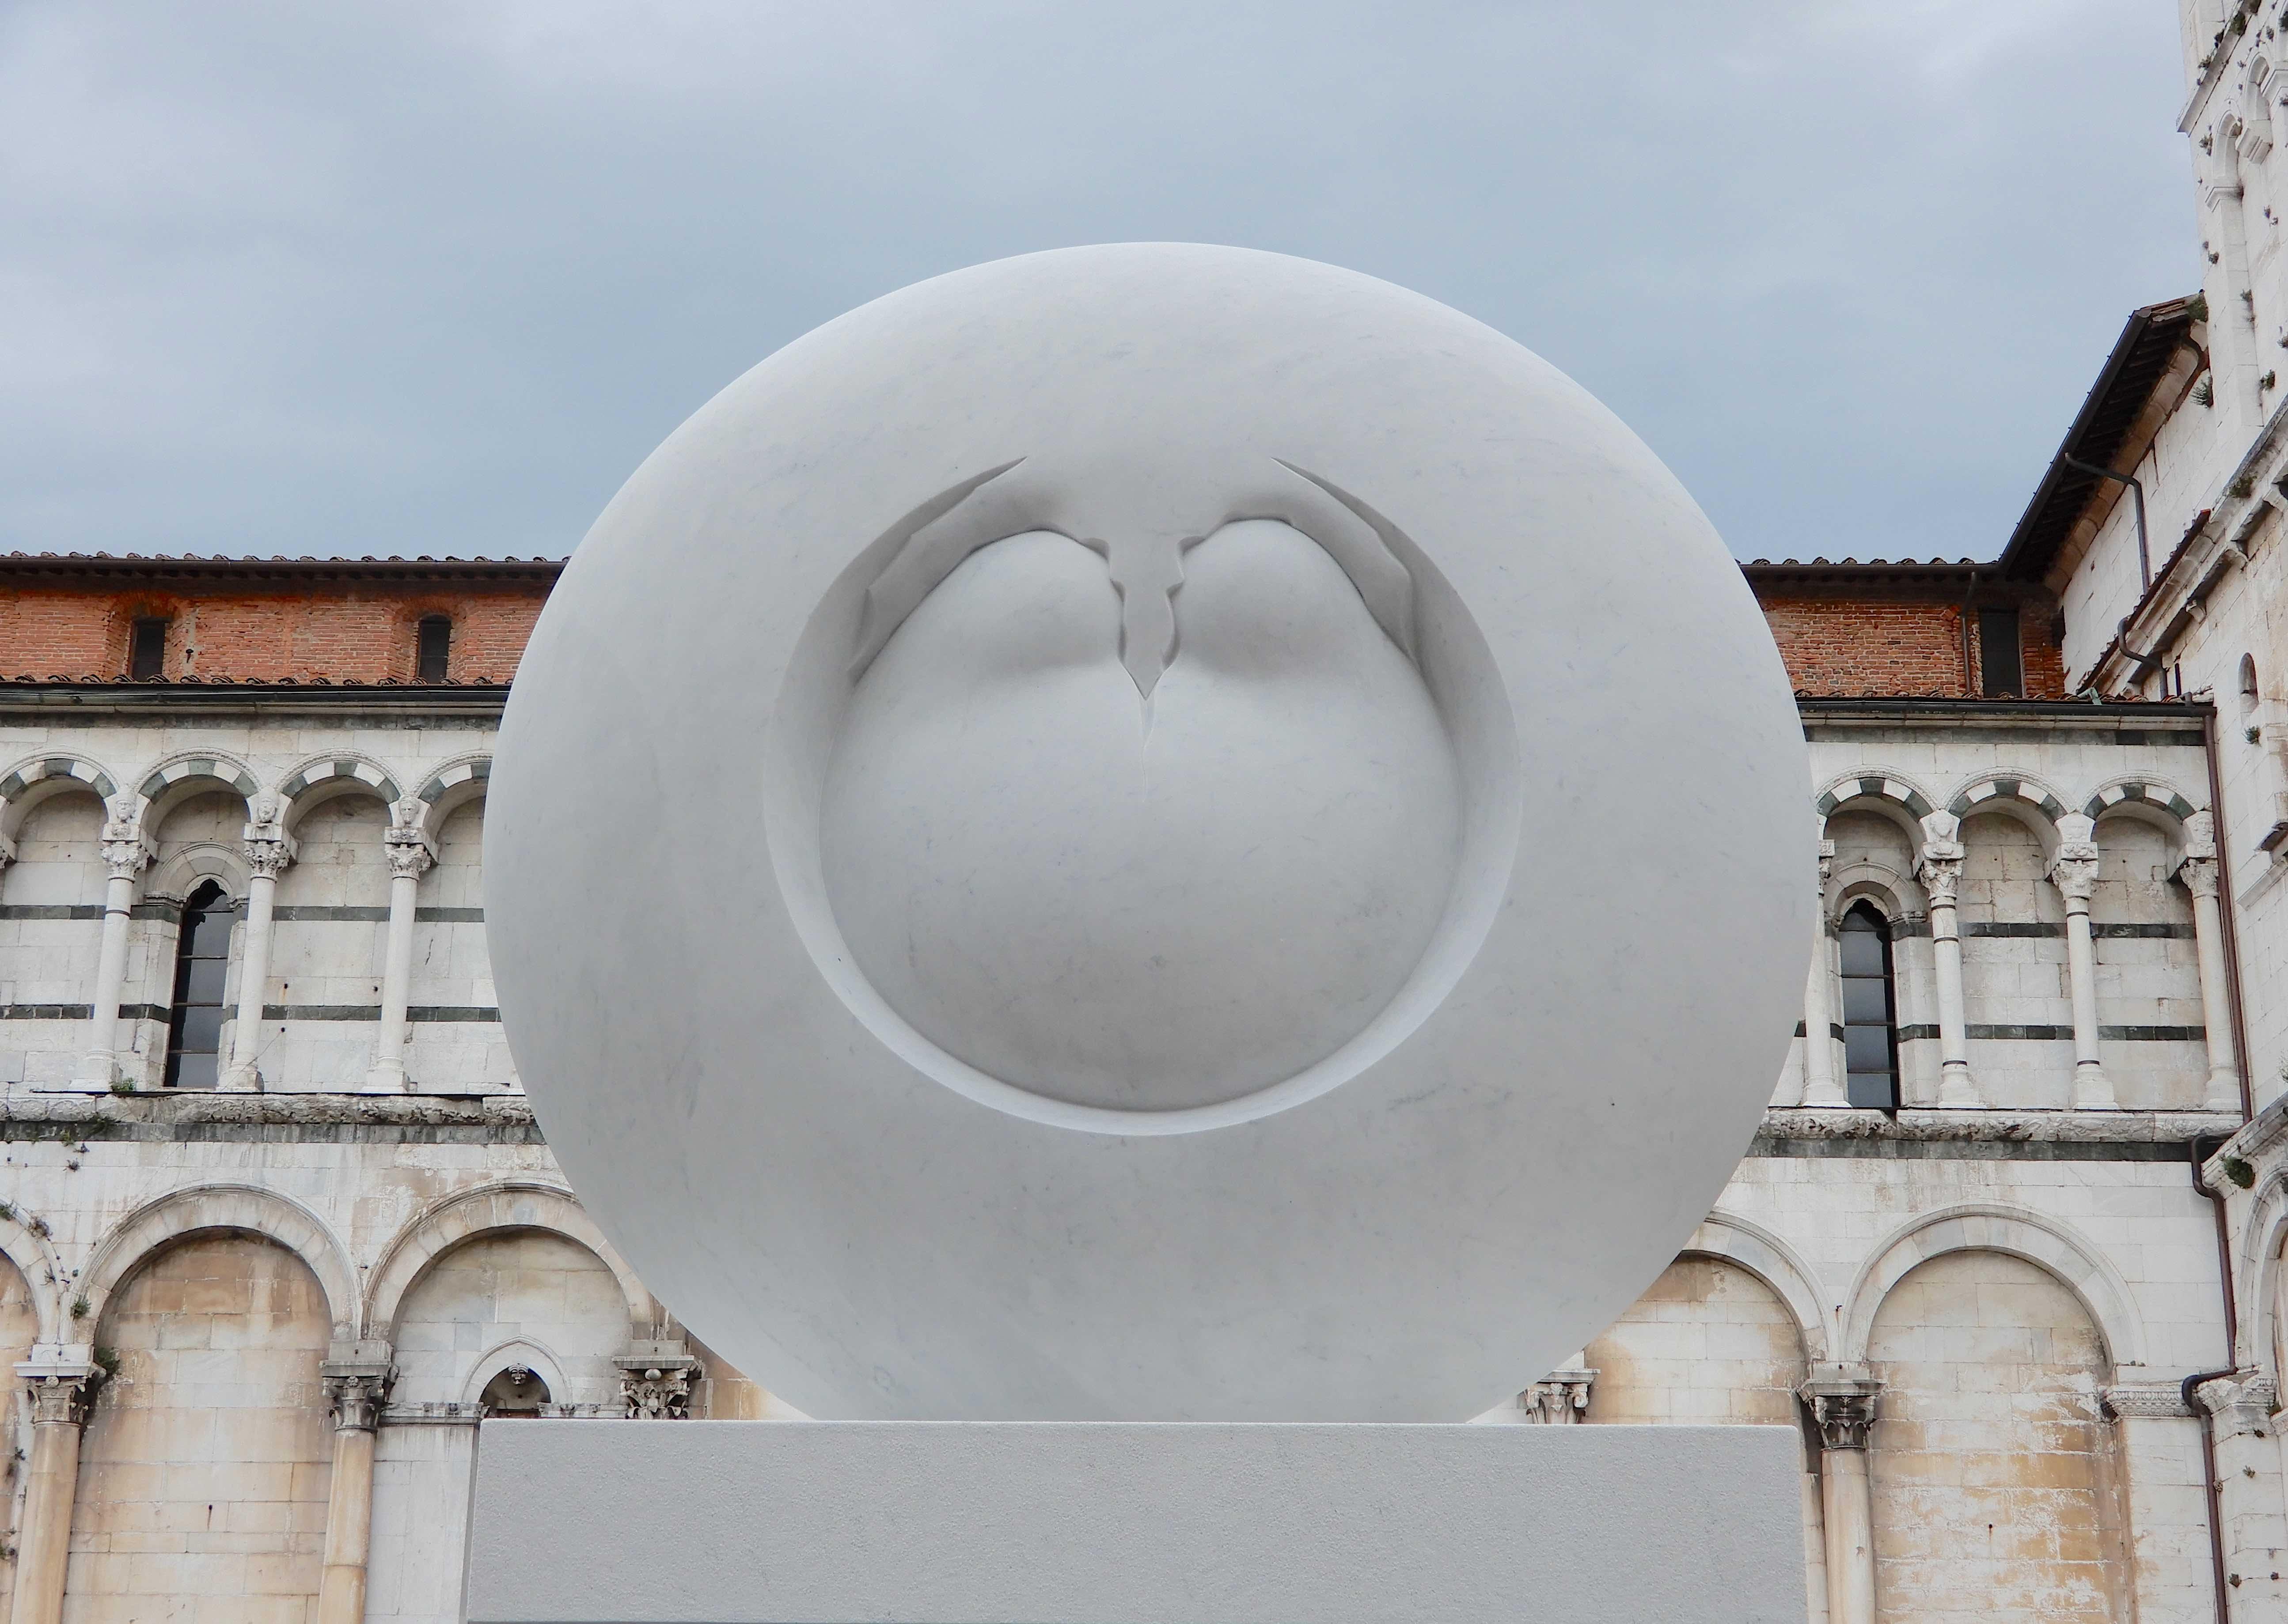 8.Mistero, Piazza San Michele